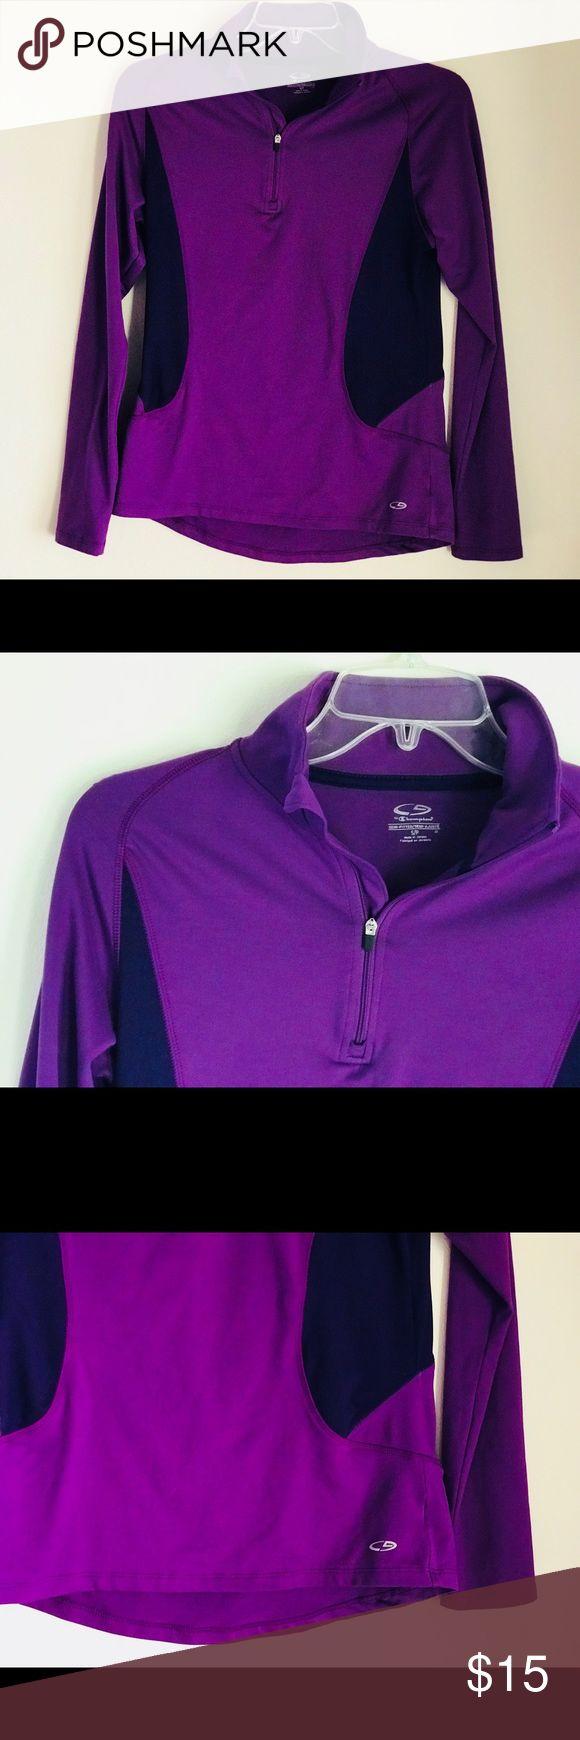 CHAMPION PURPLE SPANDEX PULLOVER Great condition Champion Tops Sweatshirts & Hoodies